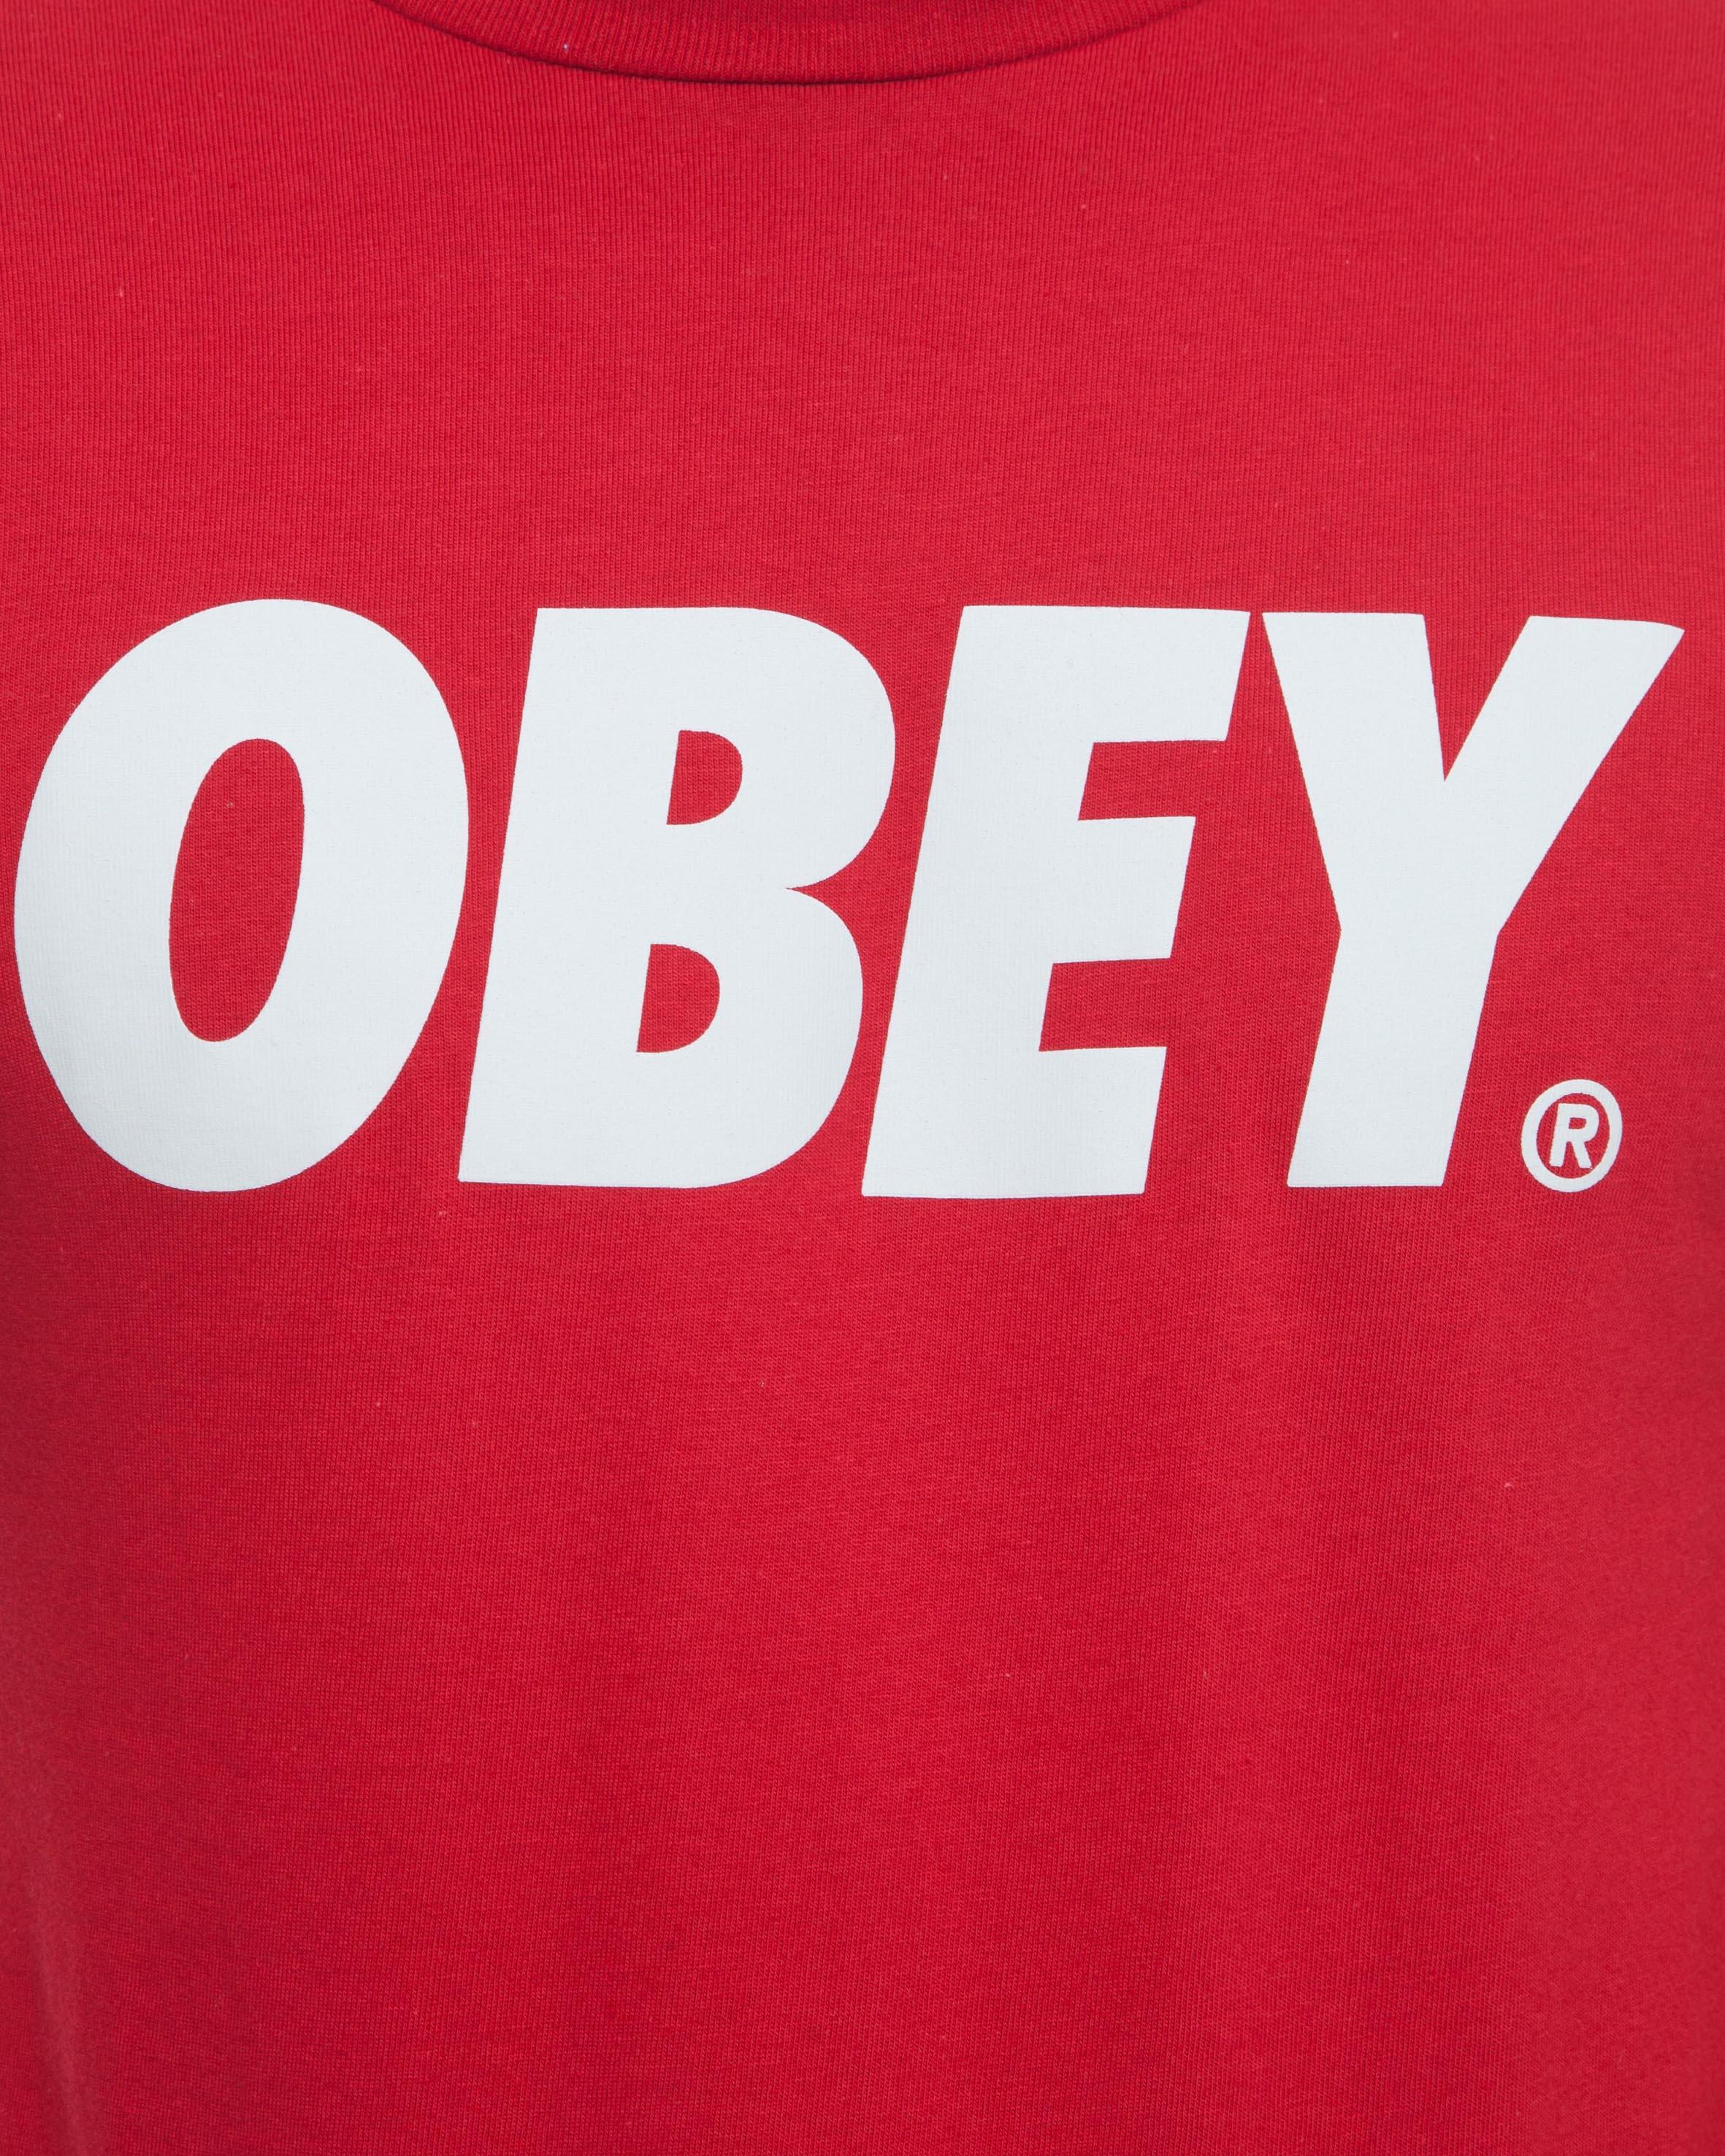 Obey Logo Related Keywords - Obey Logo Long Tail Keywords ...